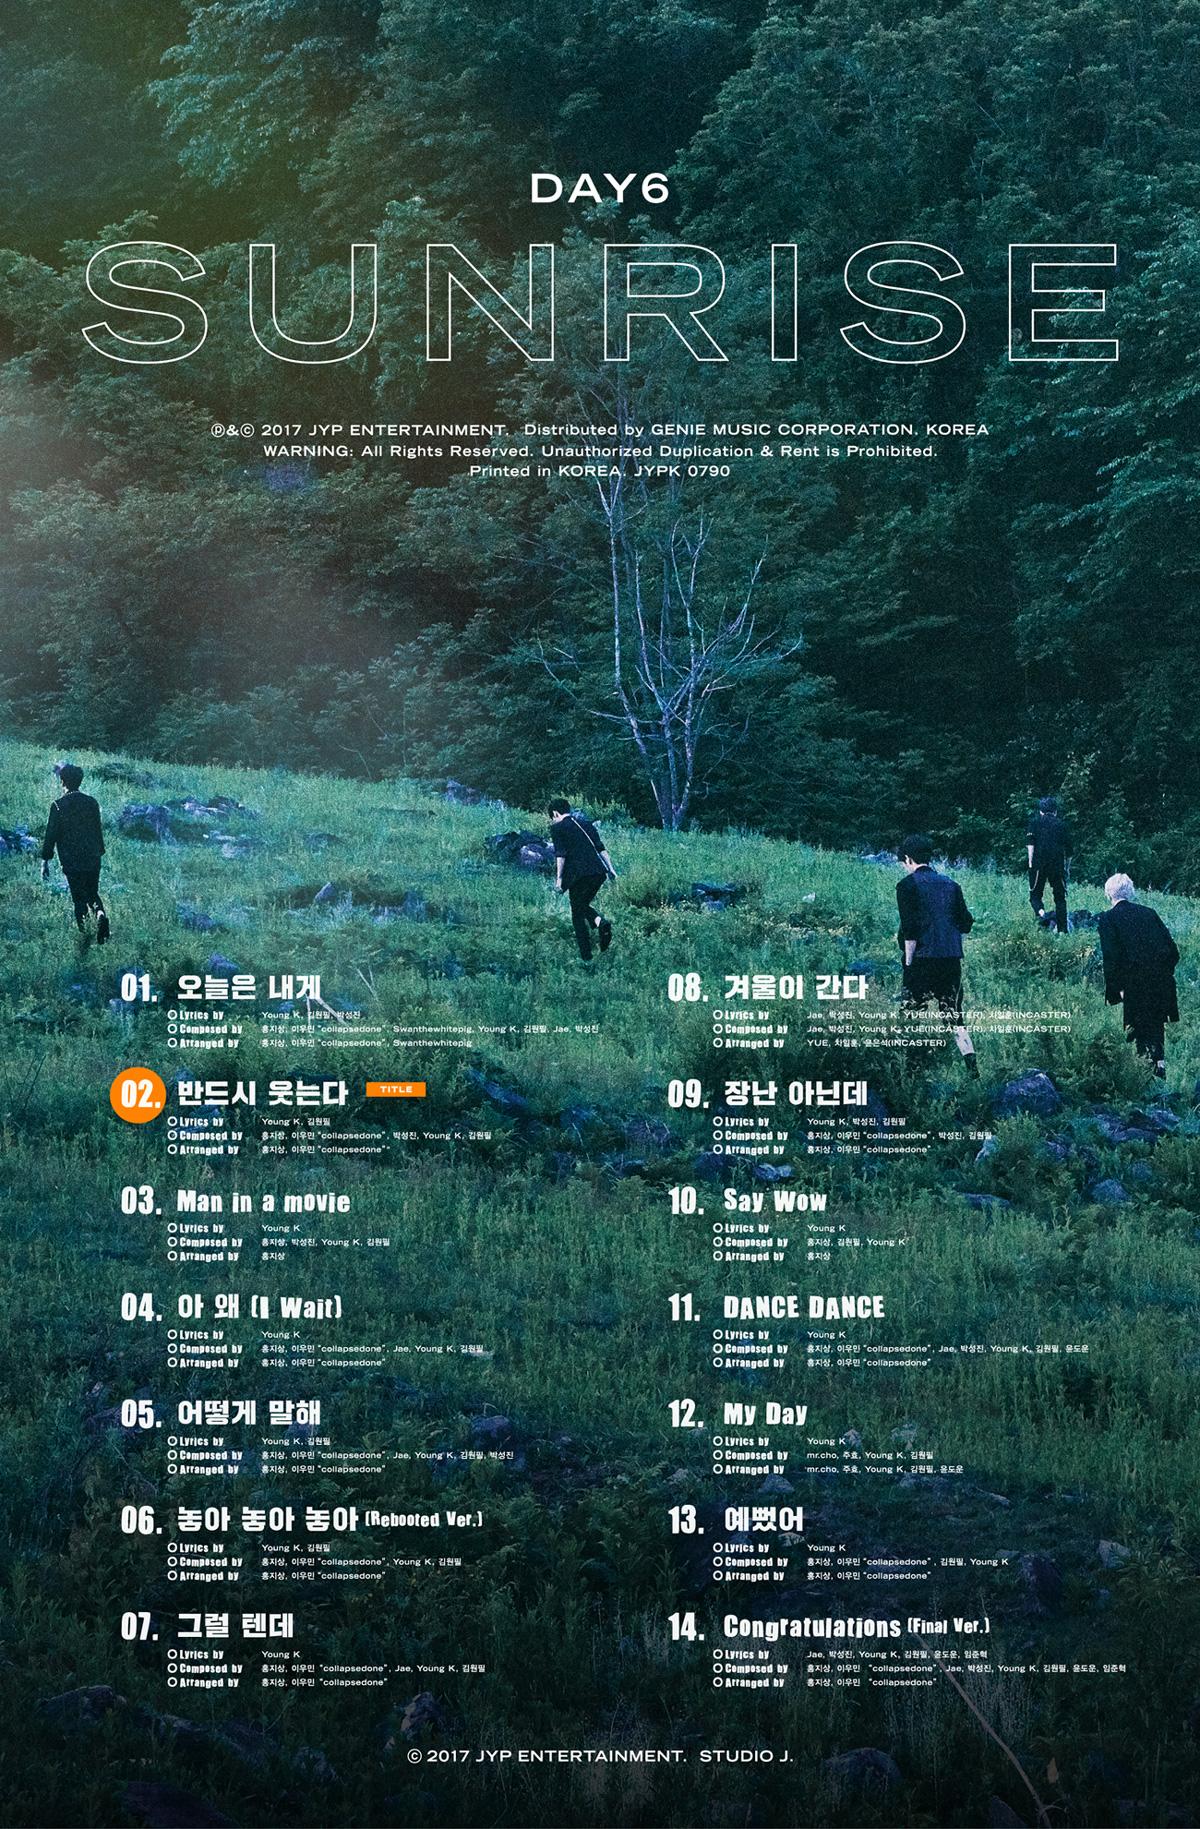 (Source: JYP Entertainment)